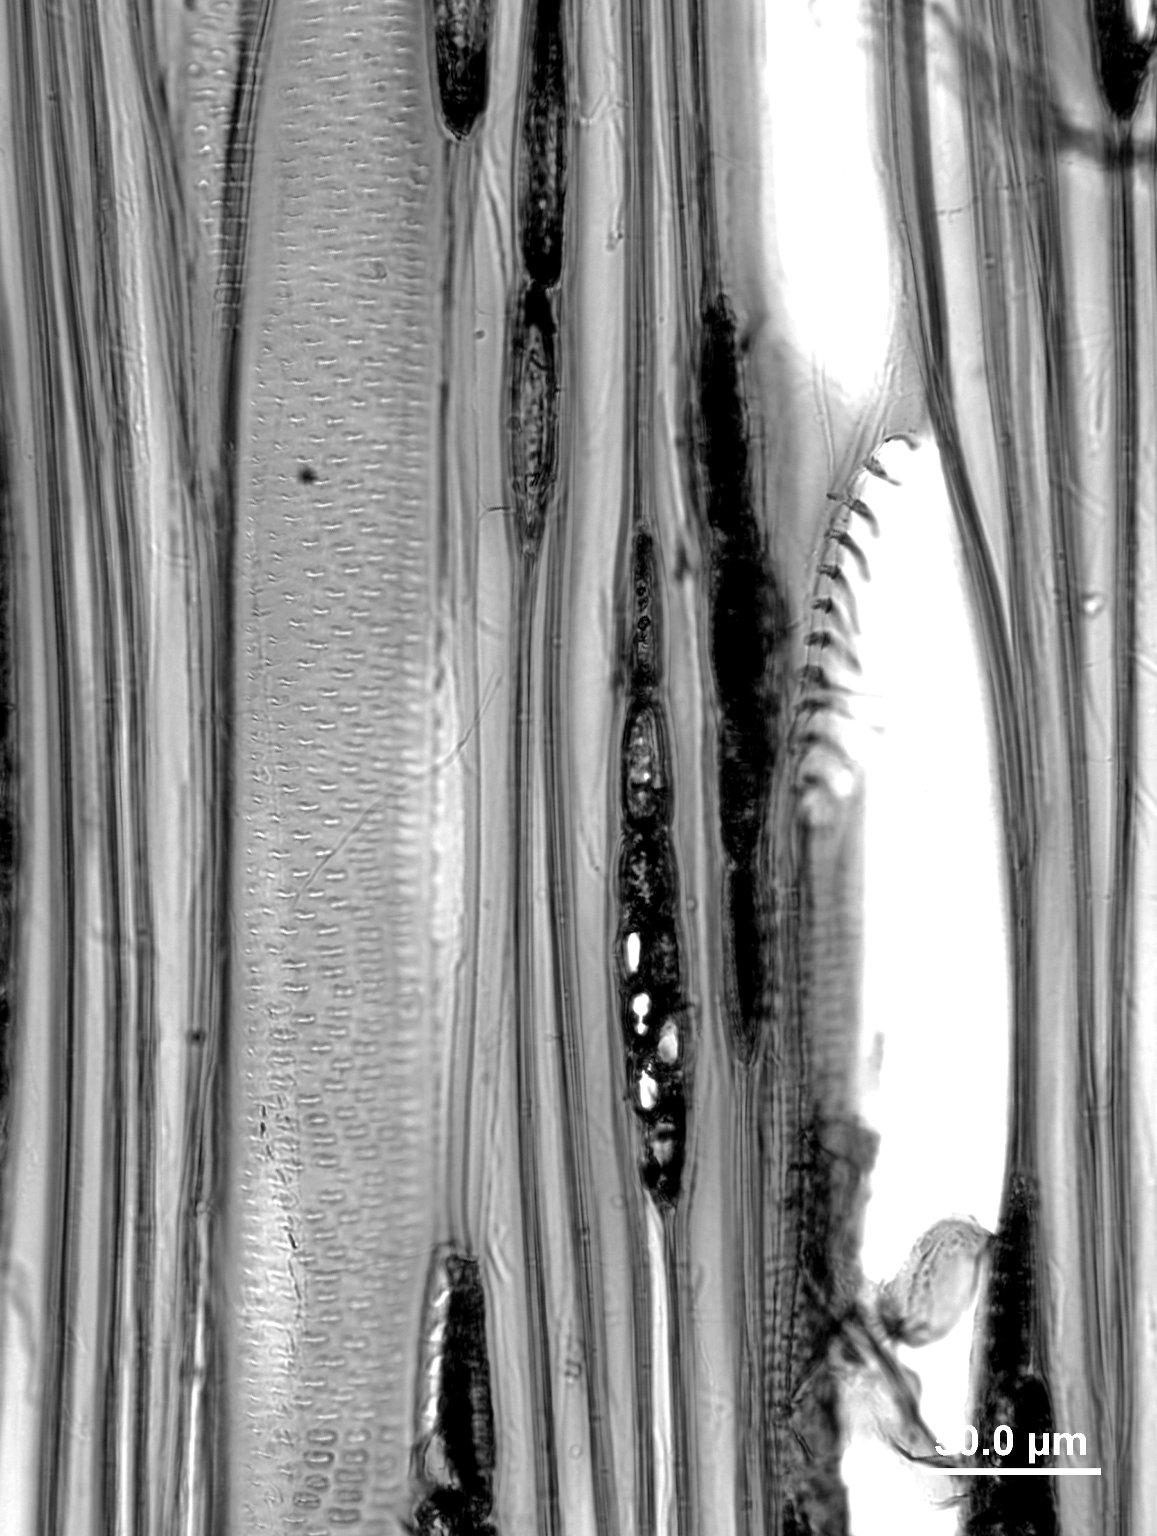 ANACARDIACEAE Campnosperma zeylanica